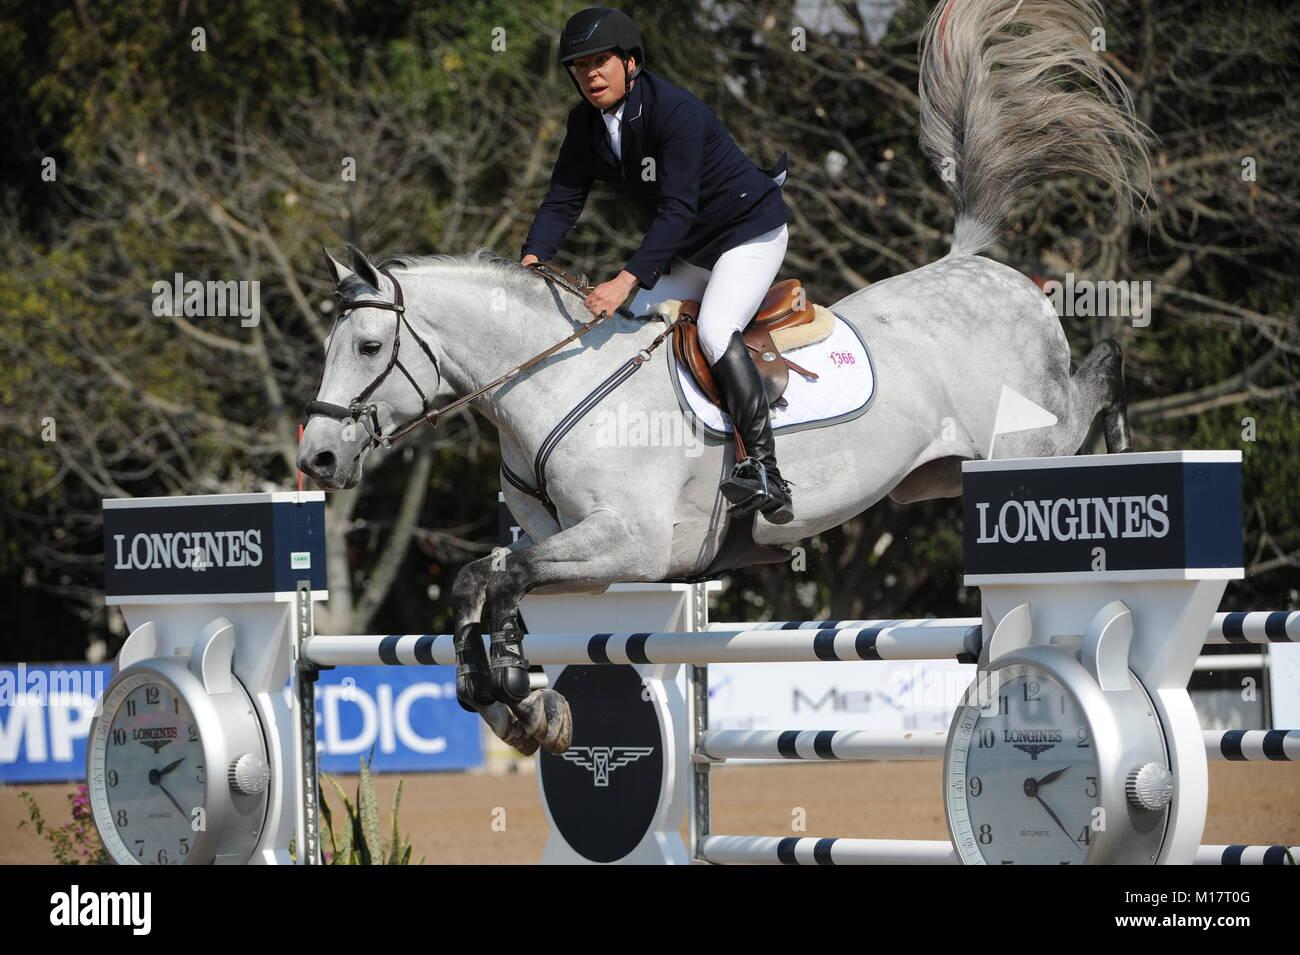 Guadalajara, Jalisco, Mexico. 27th January, 2018.CSI 4*, Longines World Cup, Federico Fernandez (MEX)  riding Pegasso. - Stock Image